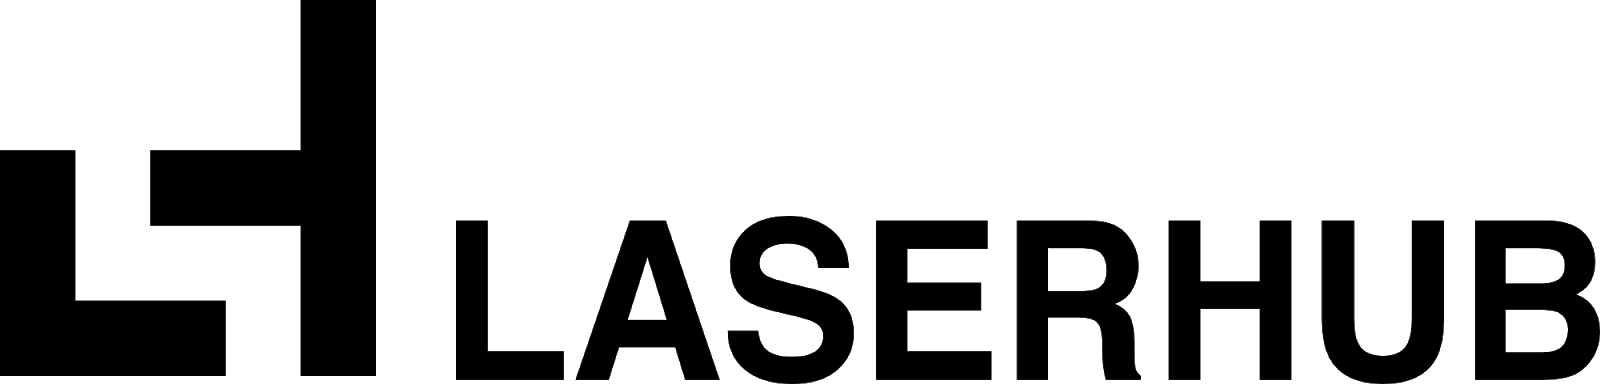 LaserHub logo